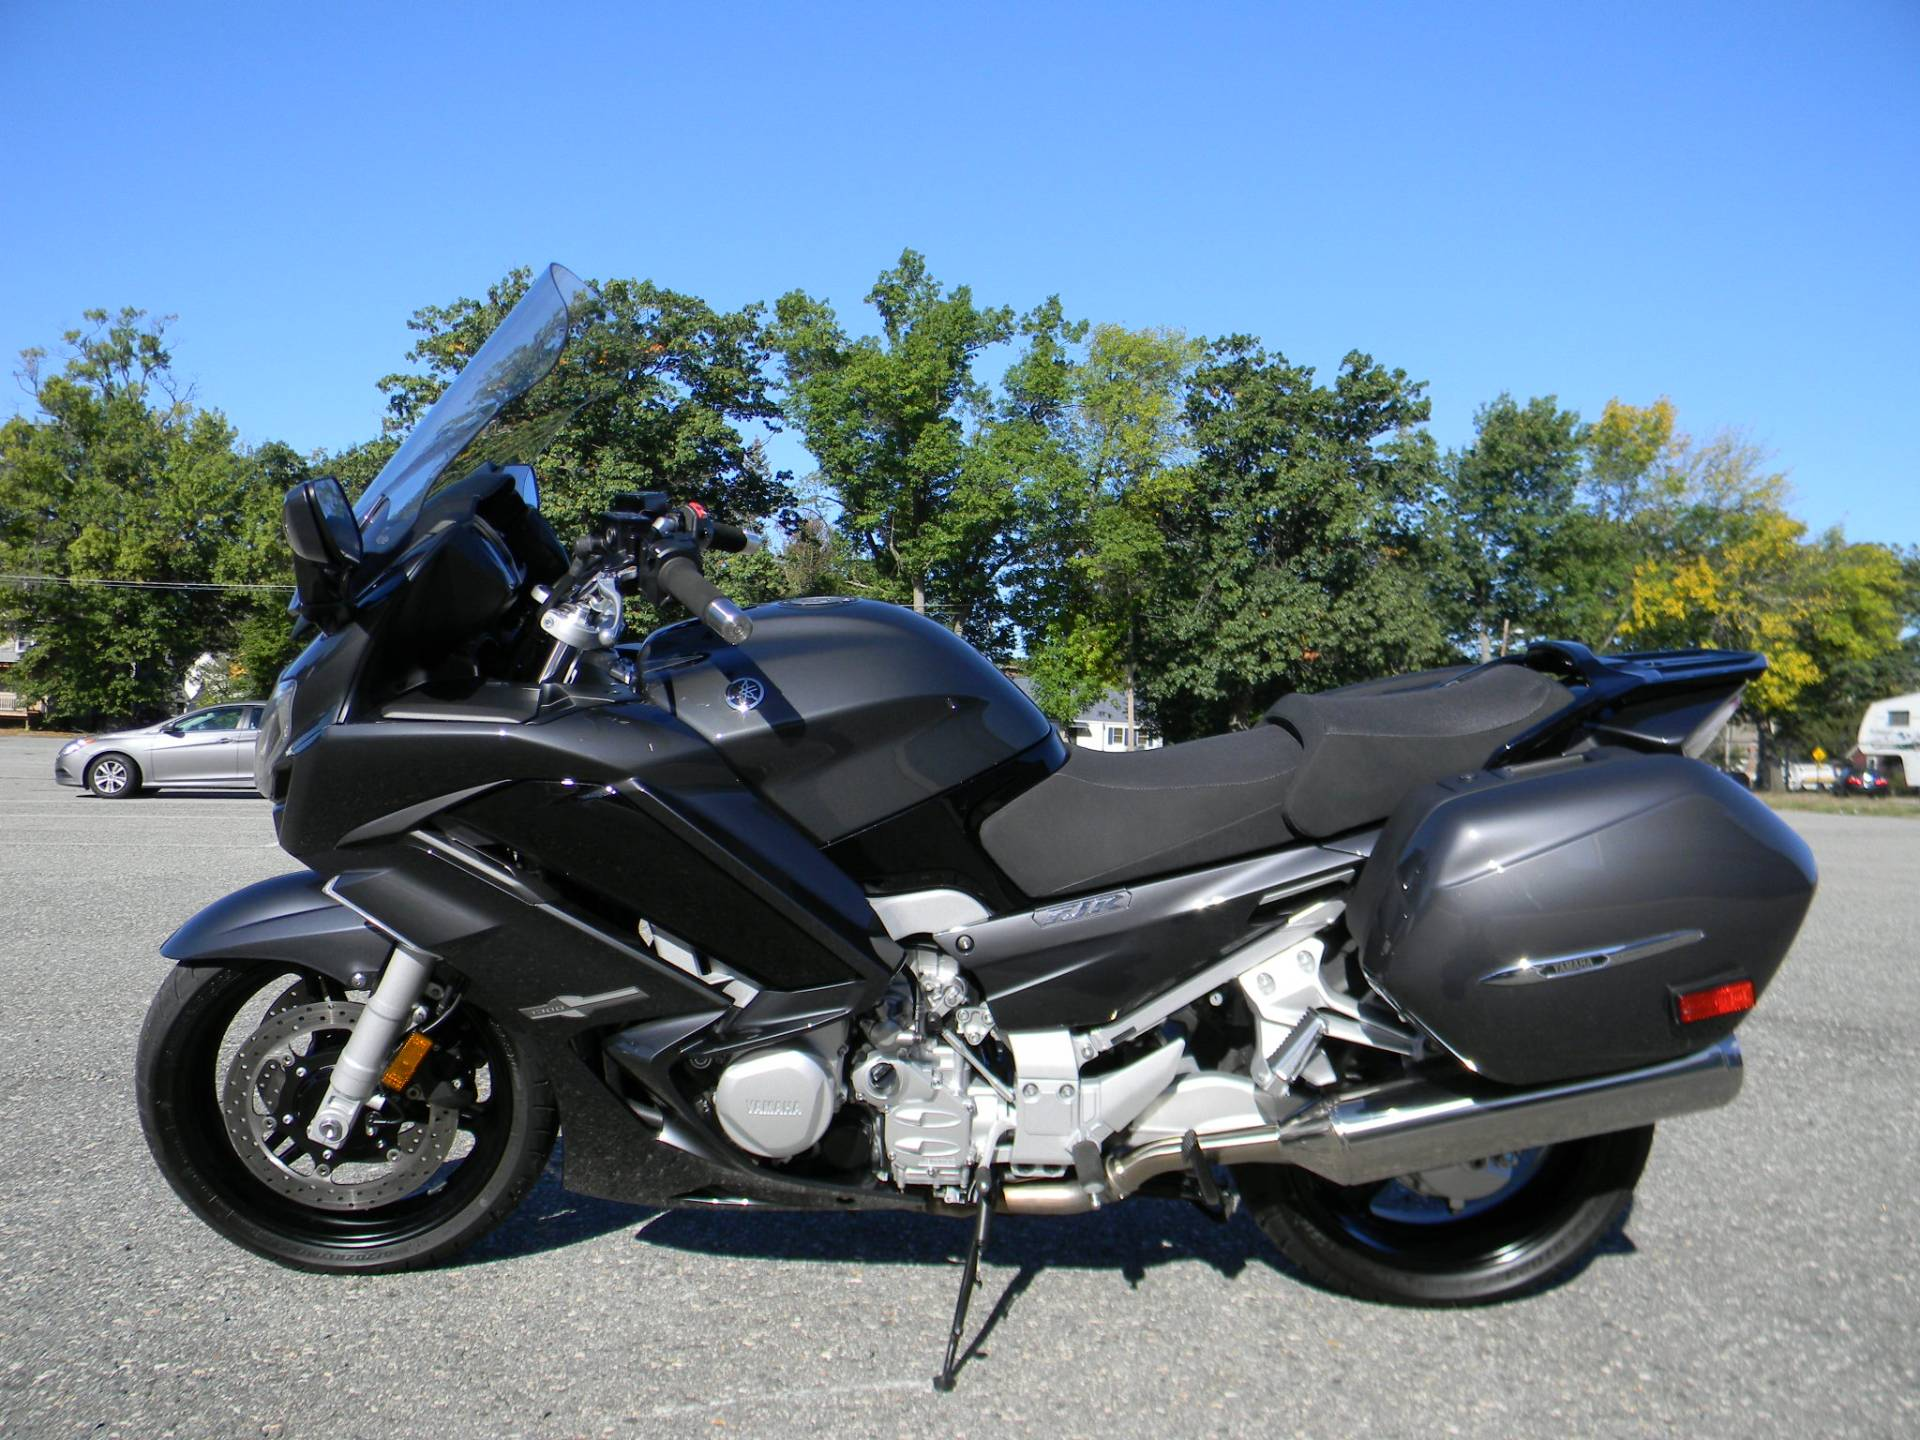 2015 Yamaha FJR1300A 5